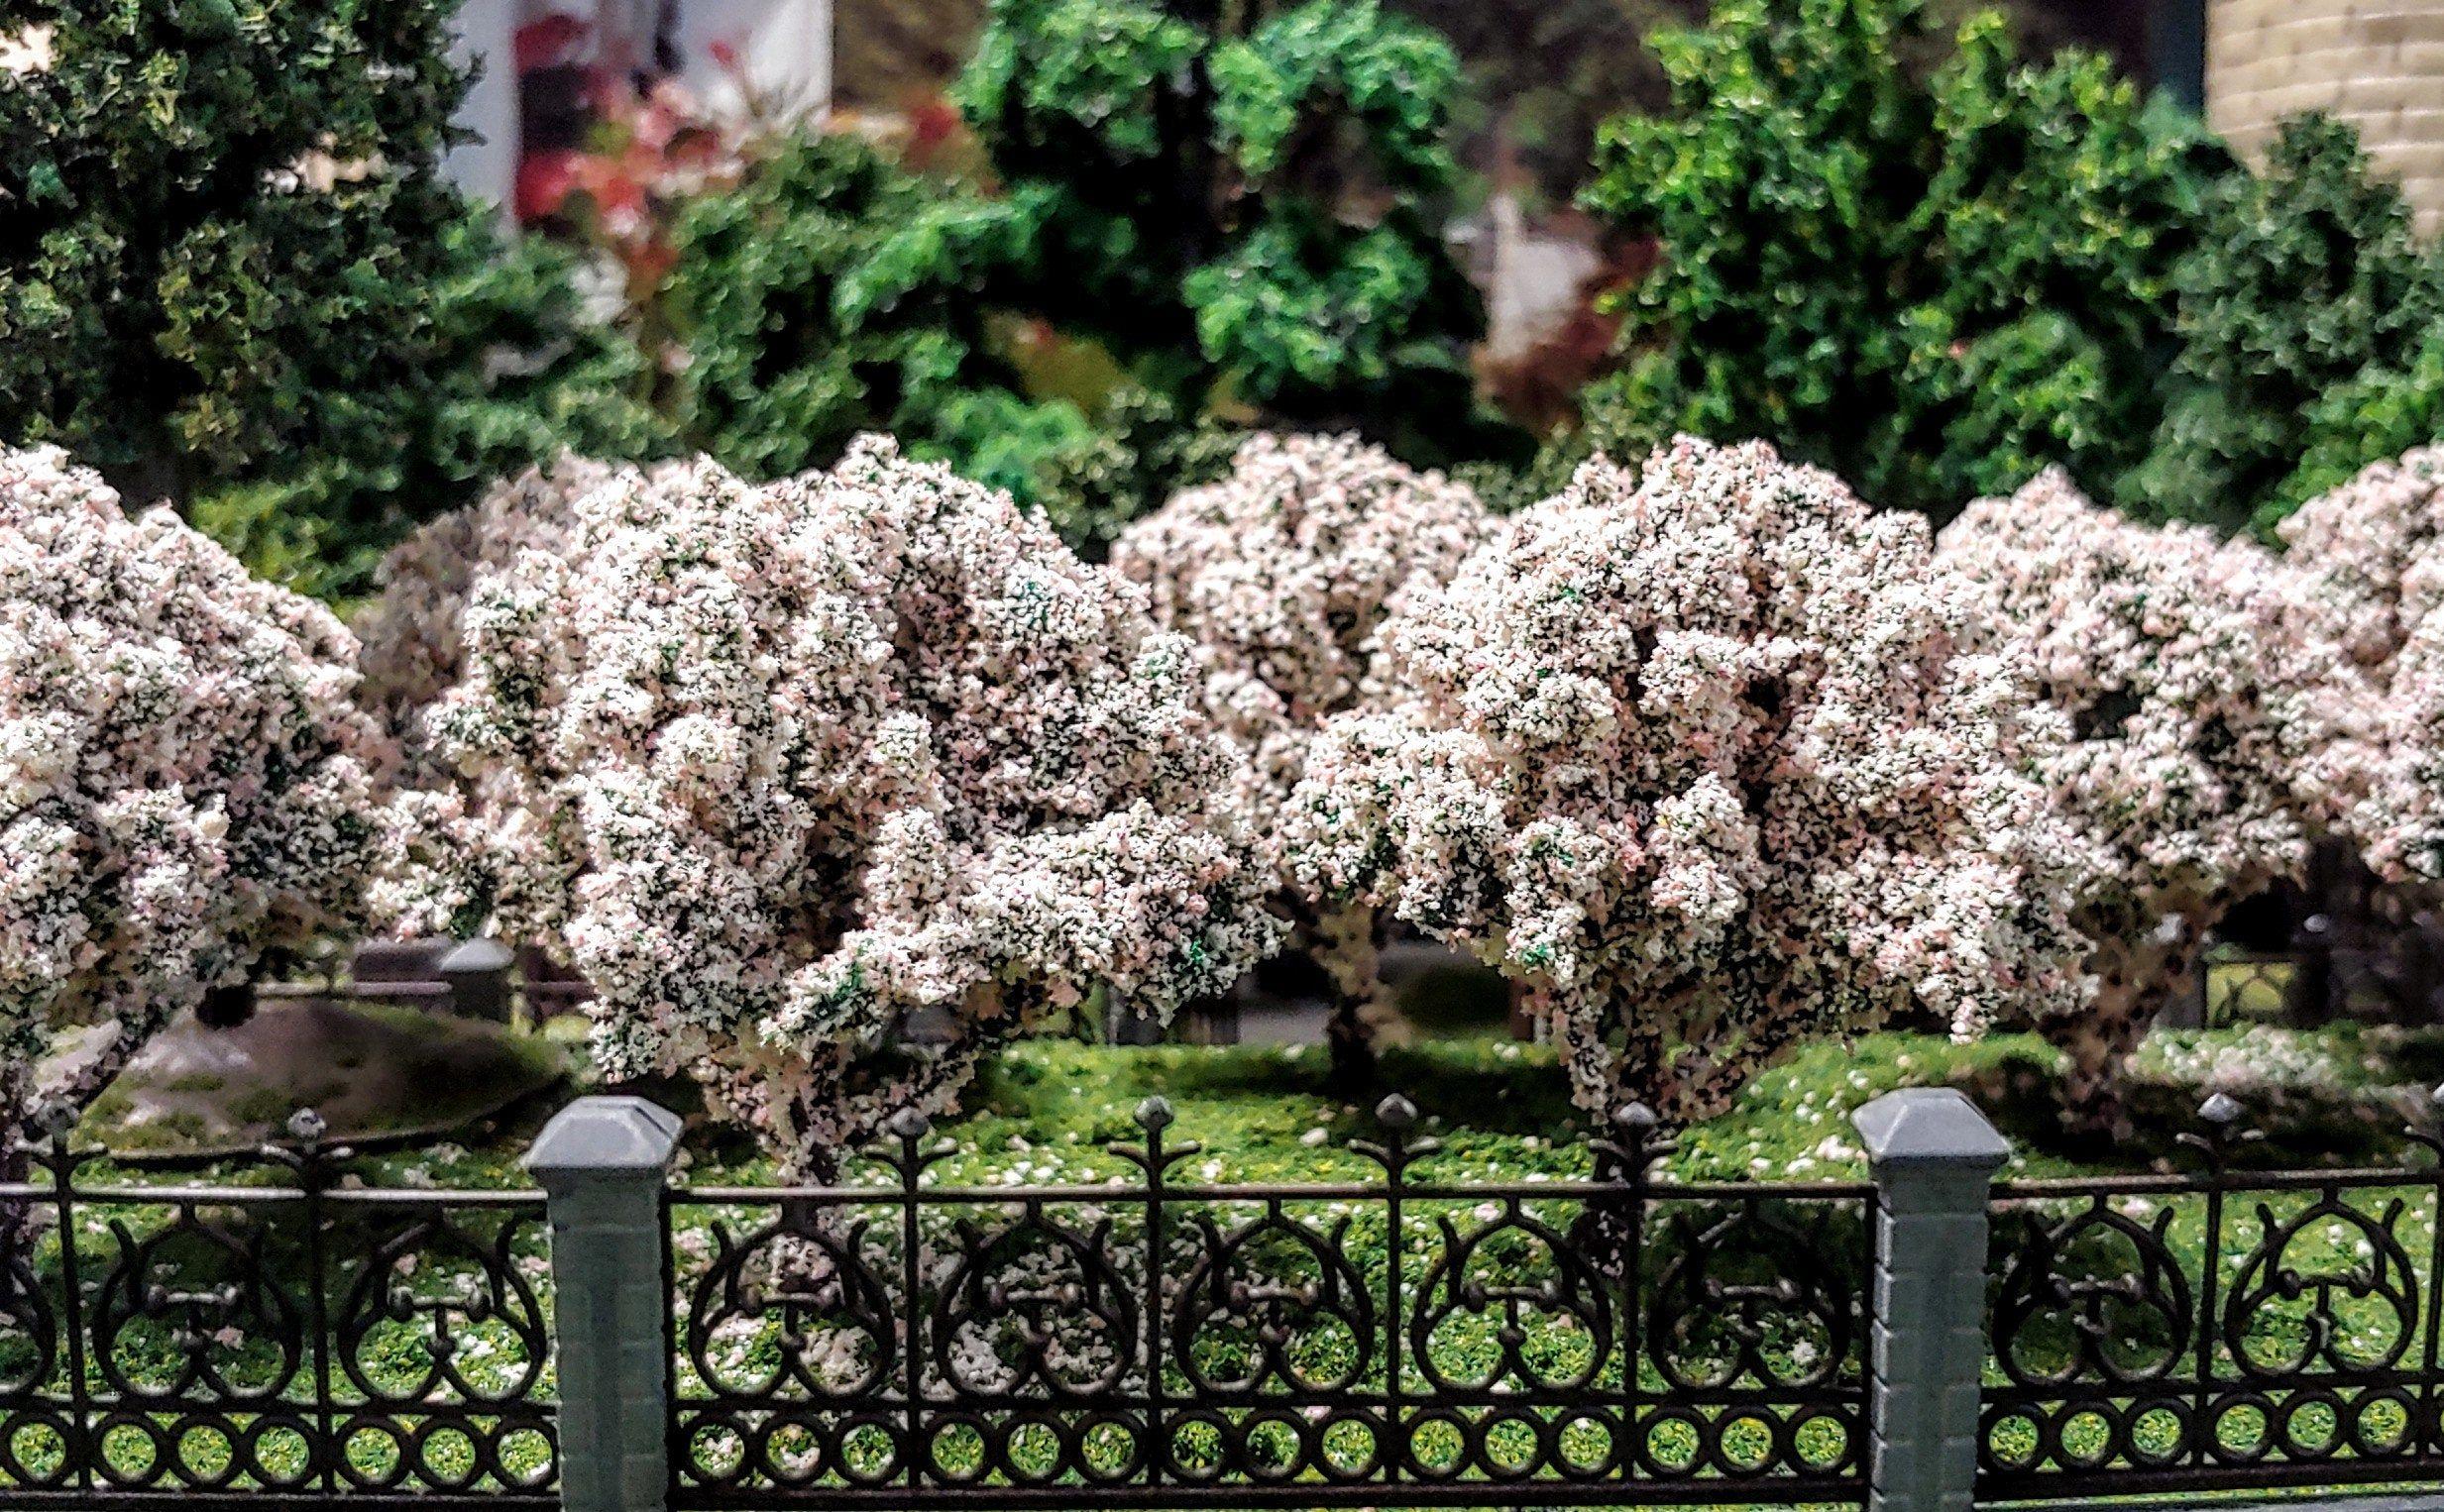 Miniature Model 2 1 2 Tall Sakura Cherry Blossom Trees Etsy Blossom Trees Cherry Blossom Tree Fairy Garden